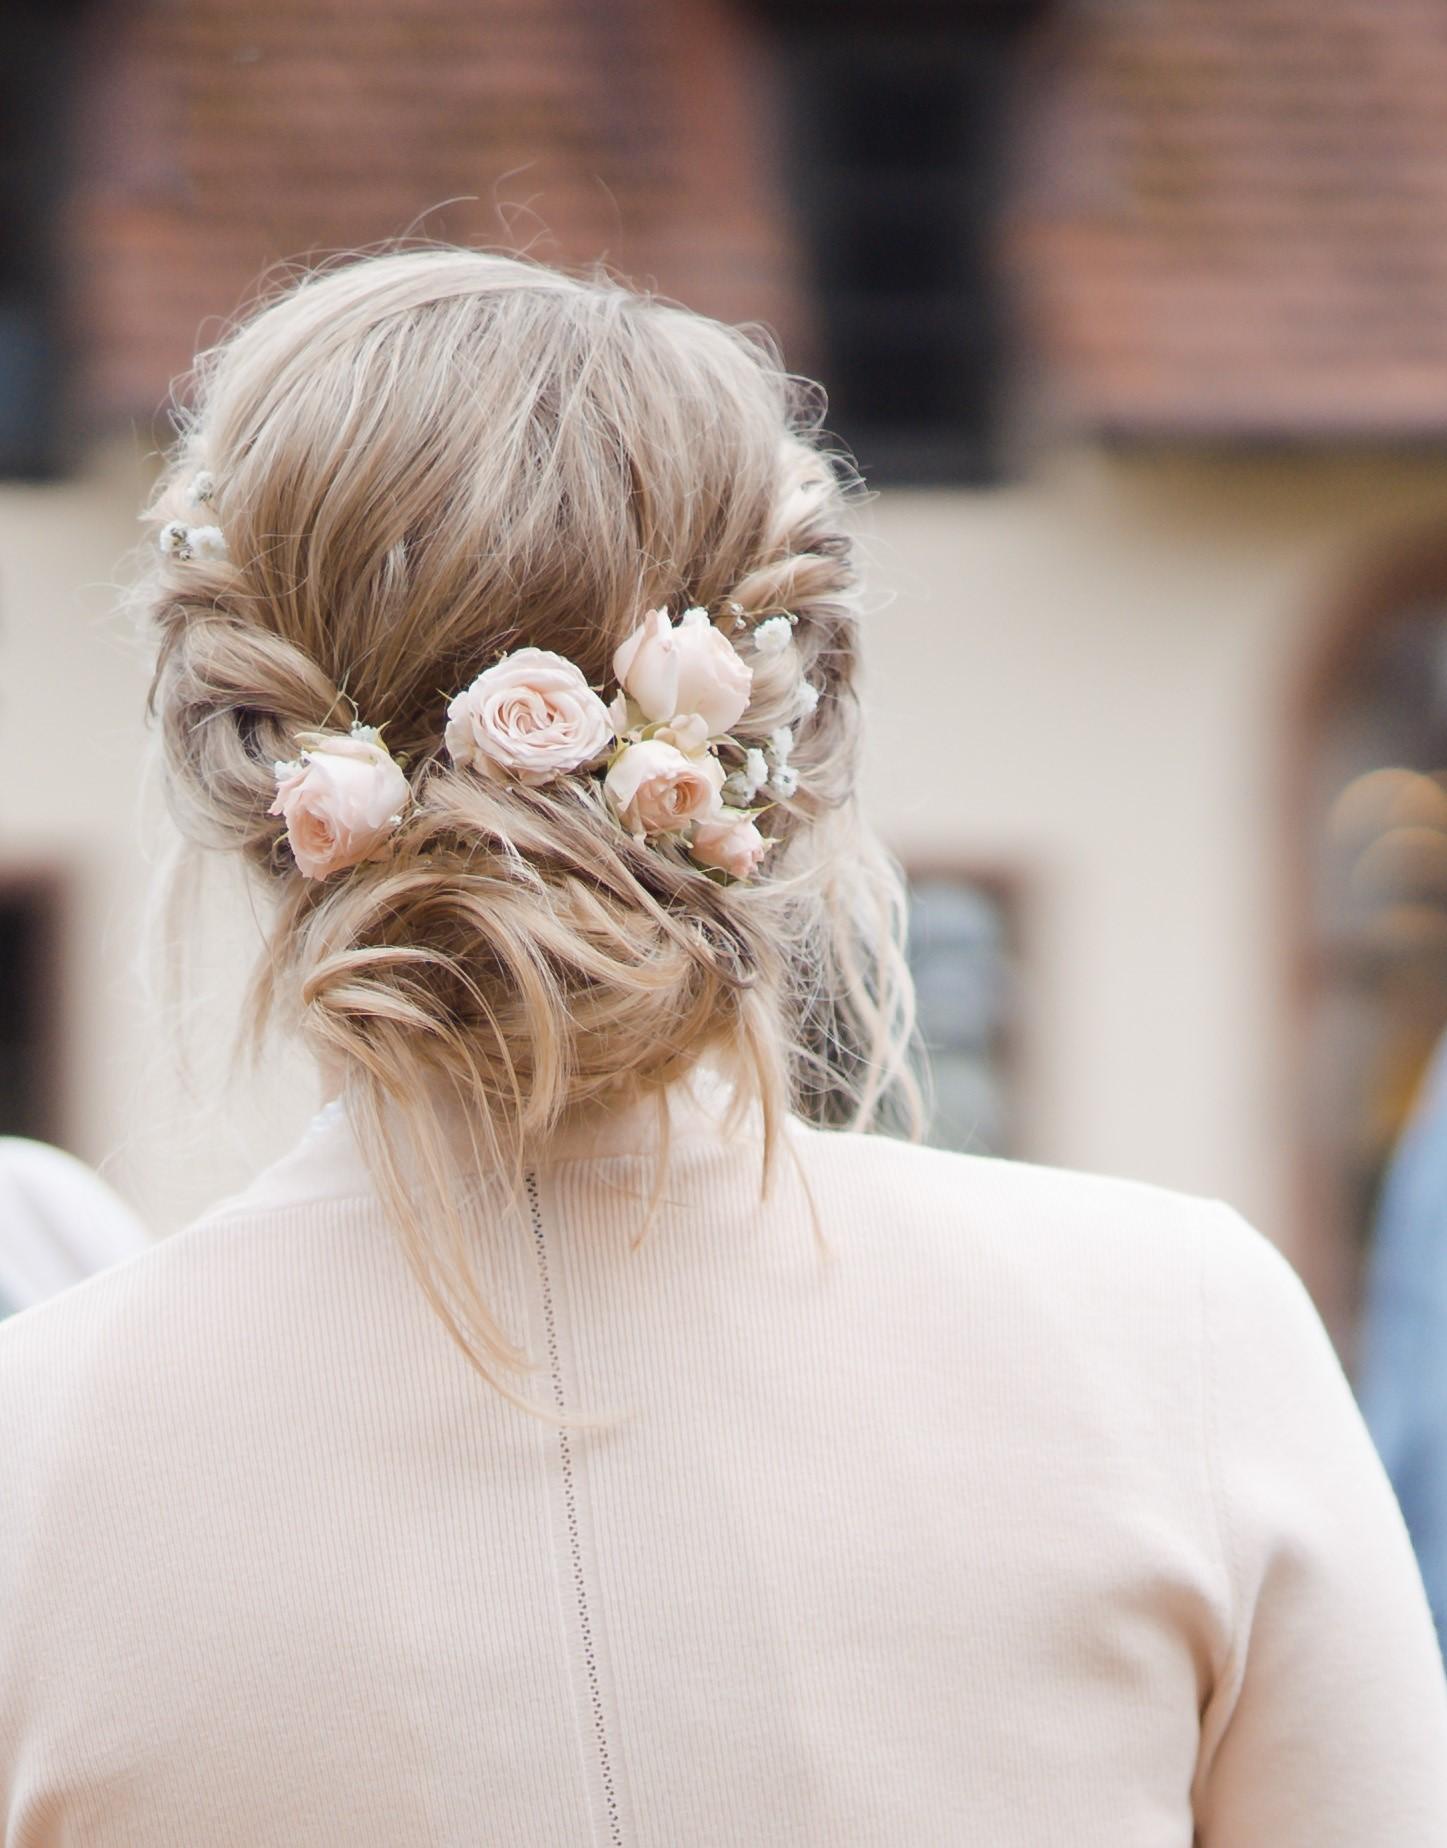 locker gestylte festsitzende Braut Frisur Foto by Nicole Haines Fotografie